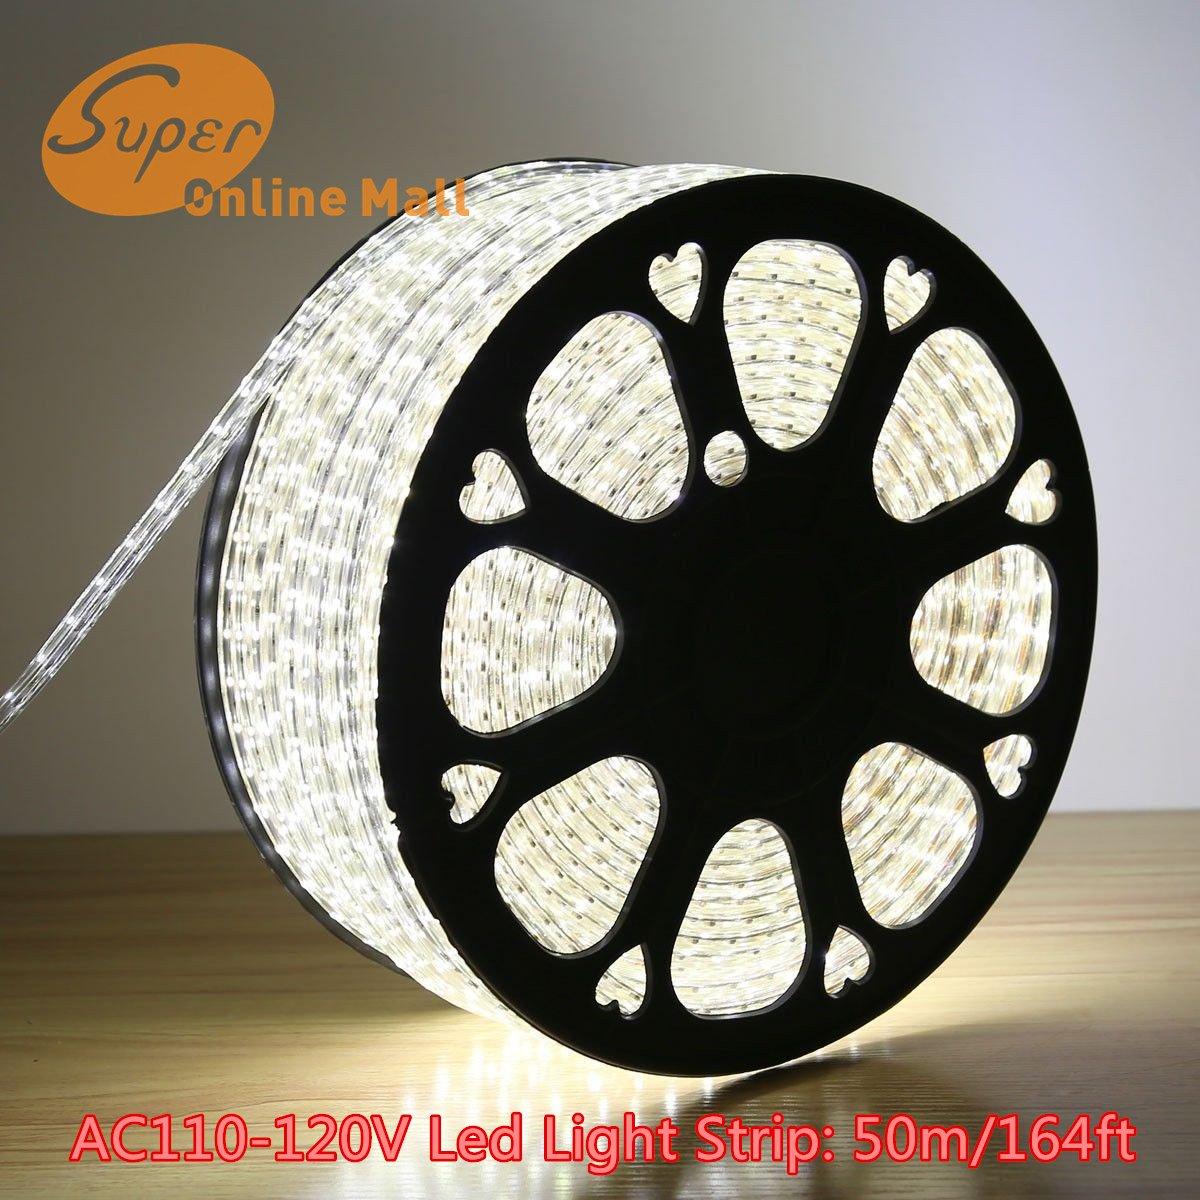 SuperonlineMall AC 110-120V Flexible Waterproof LED Strip Lights, 50m/164ft - White